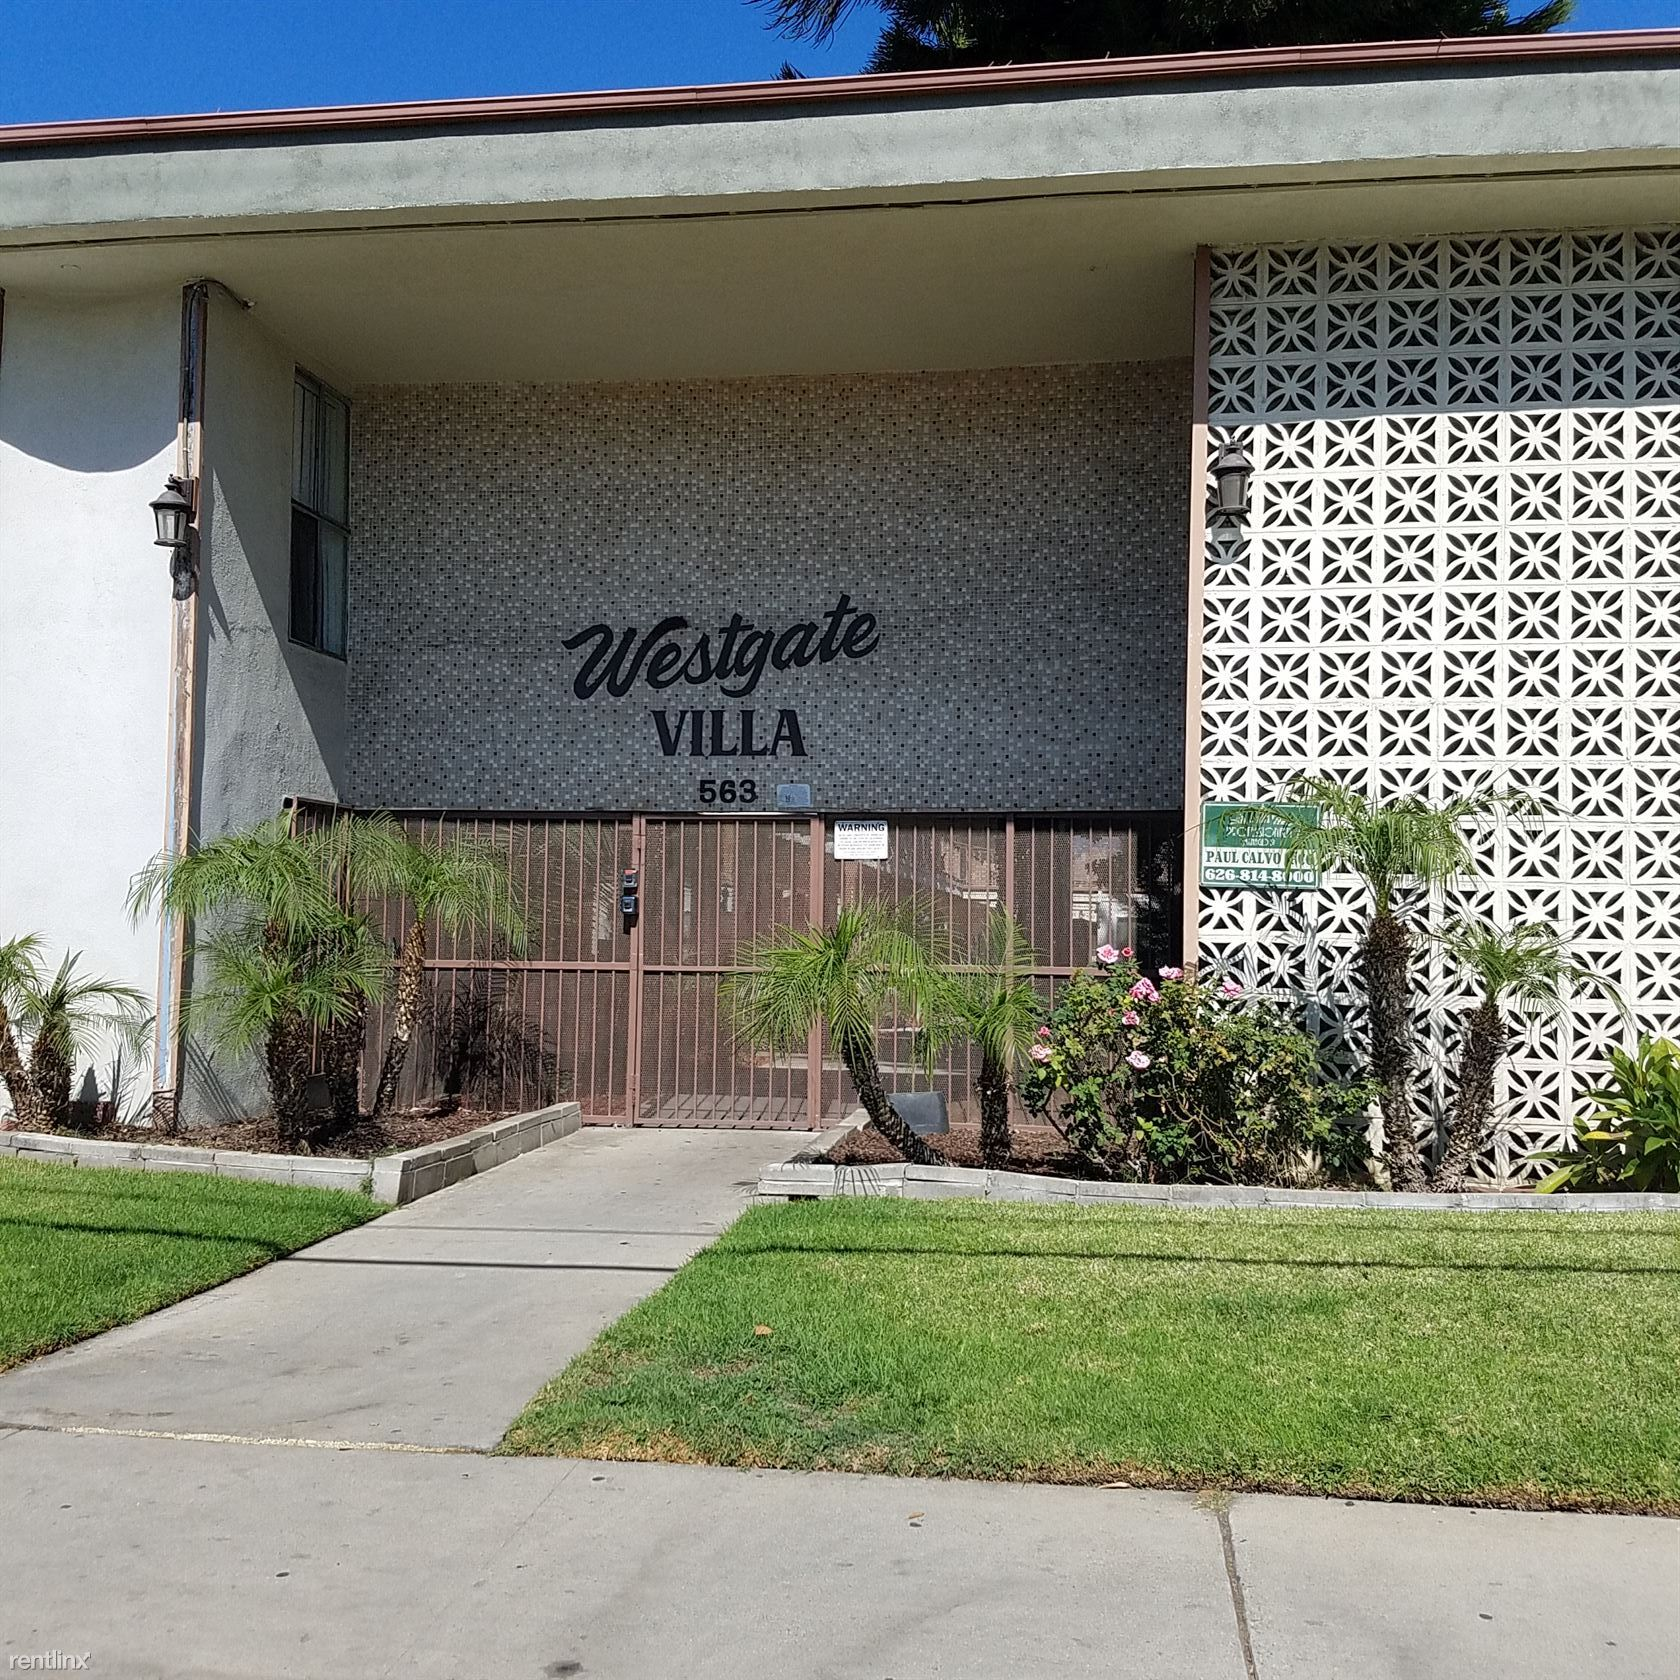 $1350 - $1585 per month , 563 E Arrow Hwy, Westgate Villa Apartments